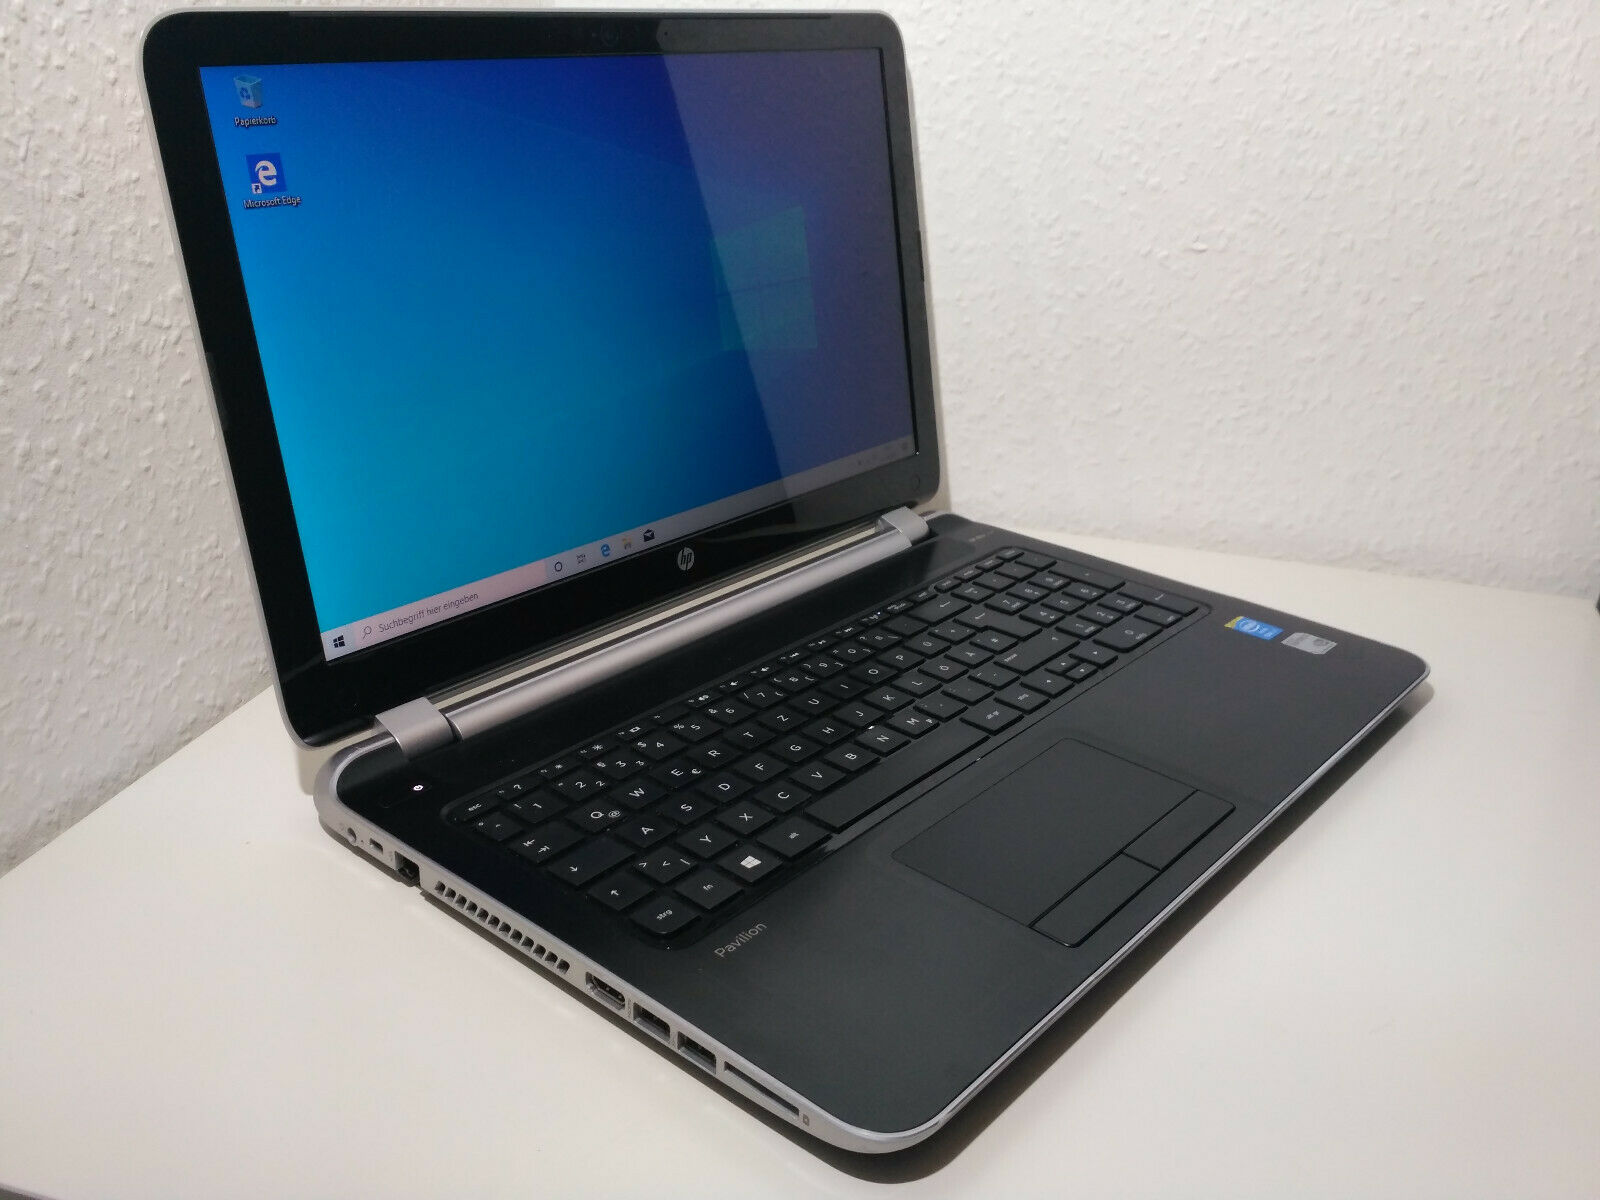 HP Pavilion 15-N021SG Laptop 15,6 Zoll HD i7-4500U, GF 740M, Windows 10 Notebook